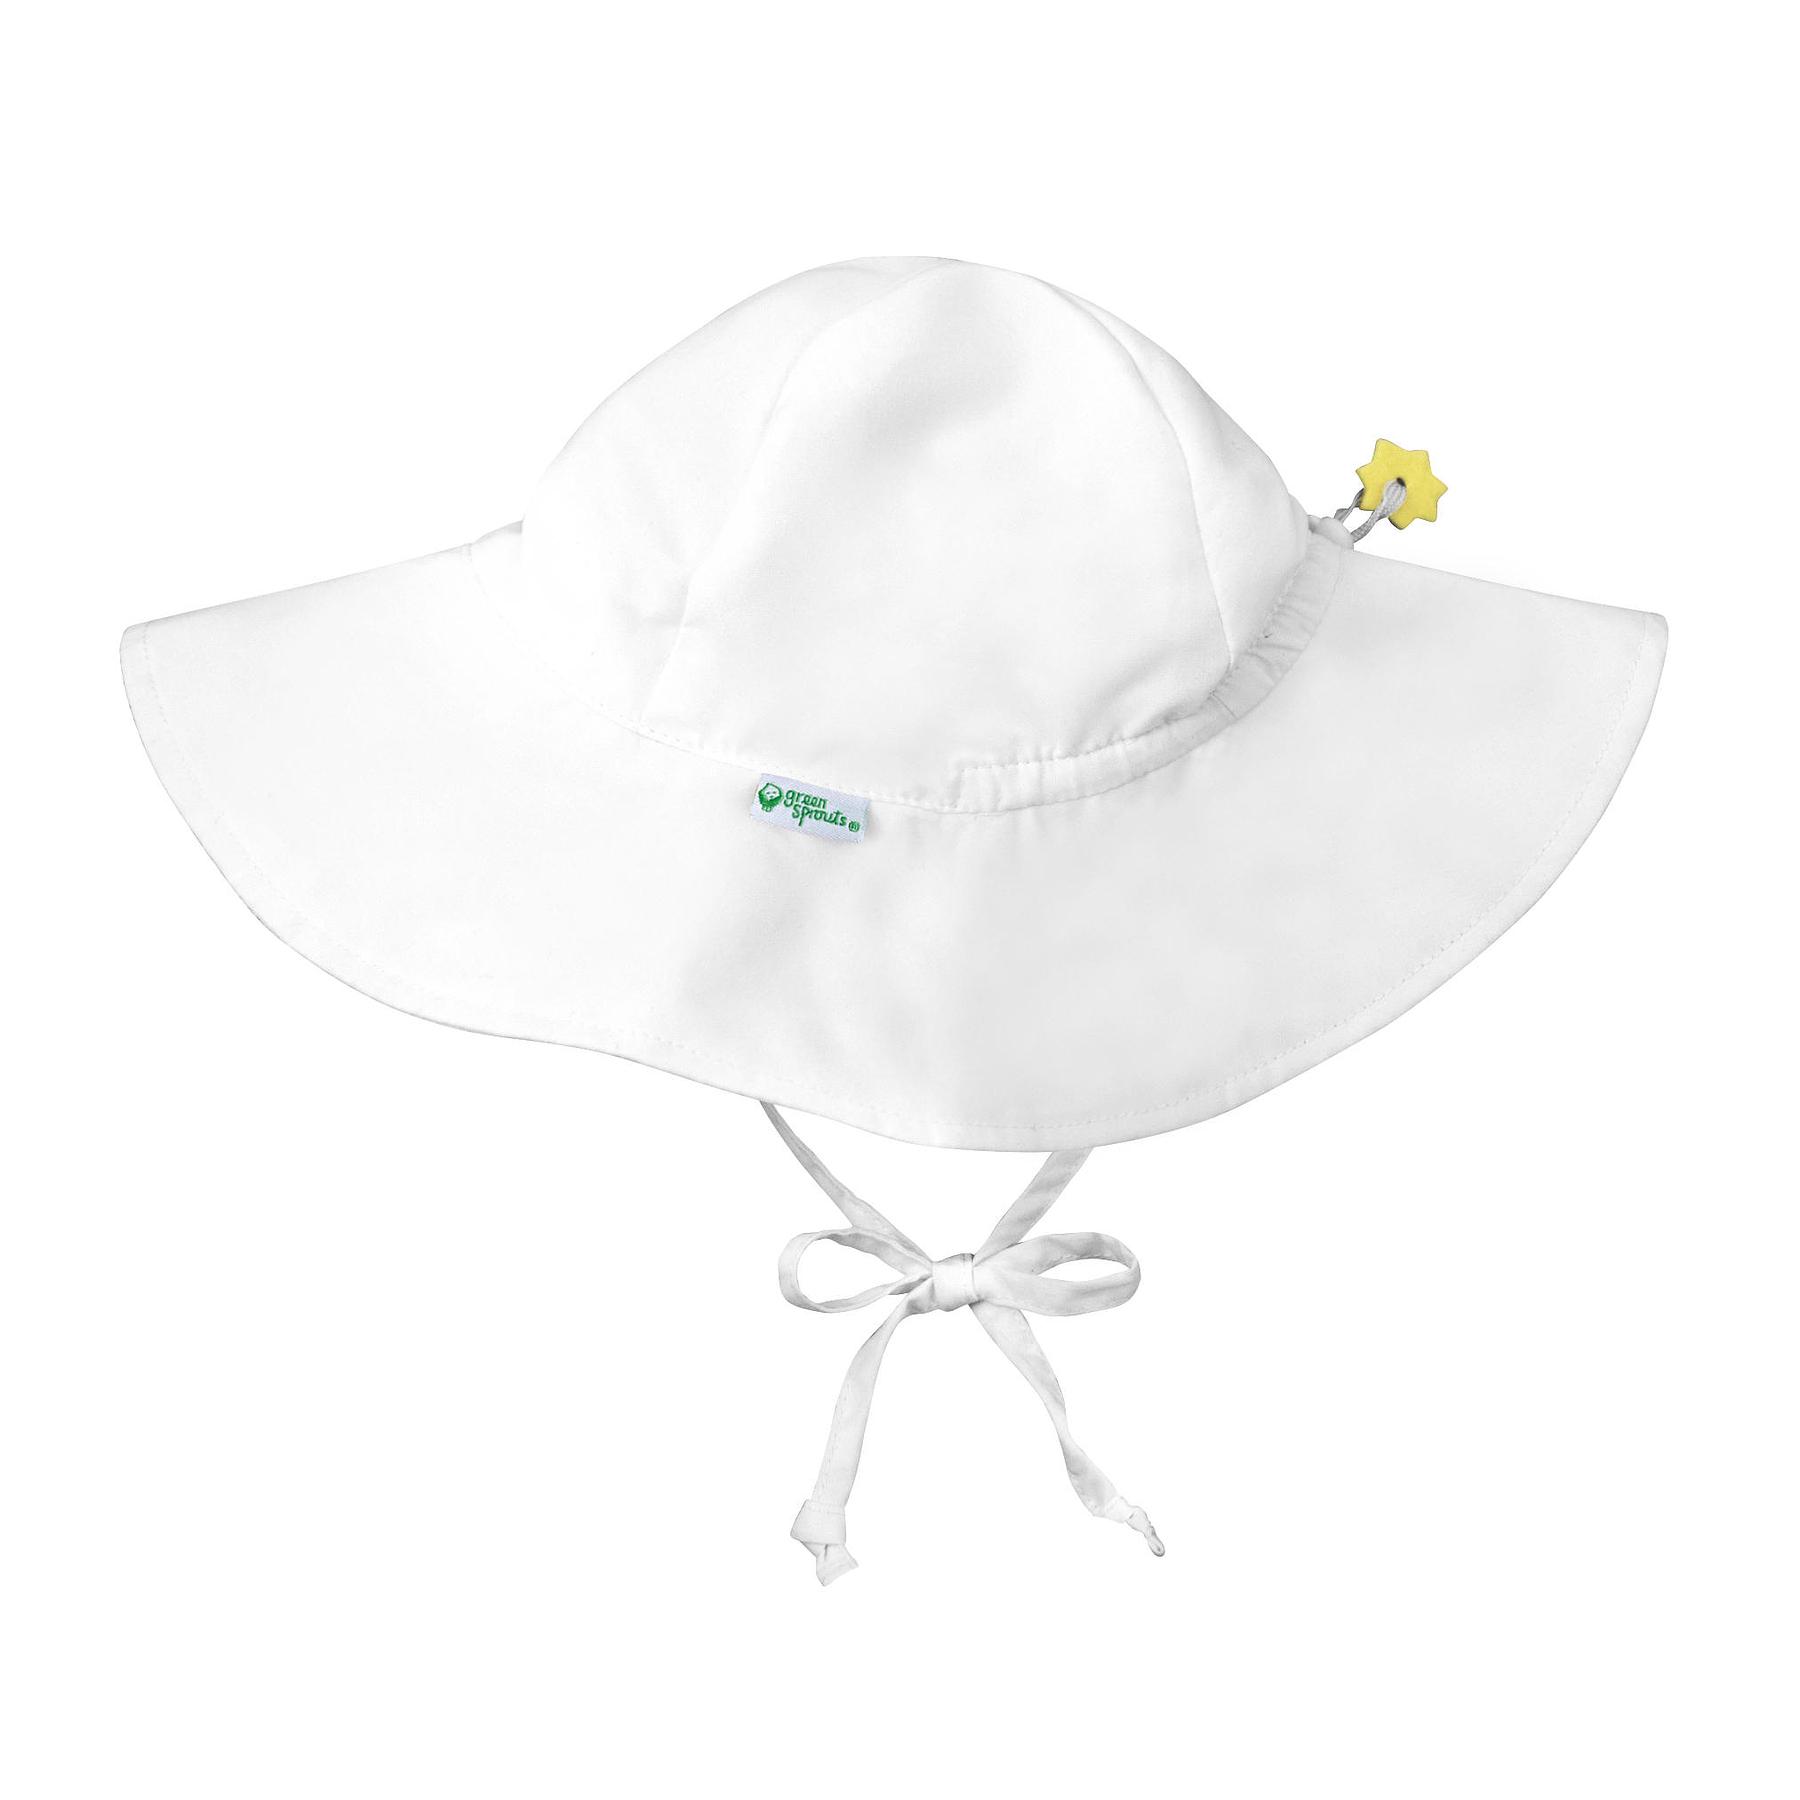 Sombrero Brim con Filtro UV Blanco I Play